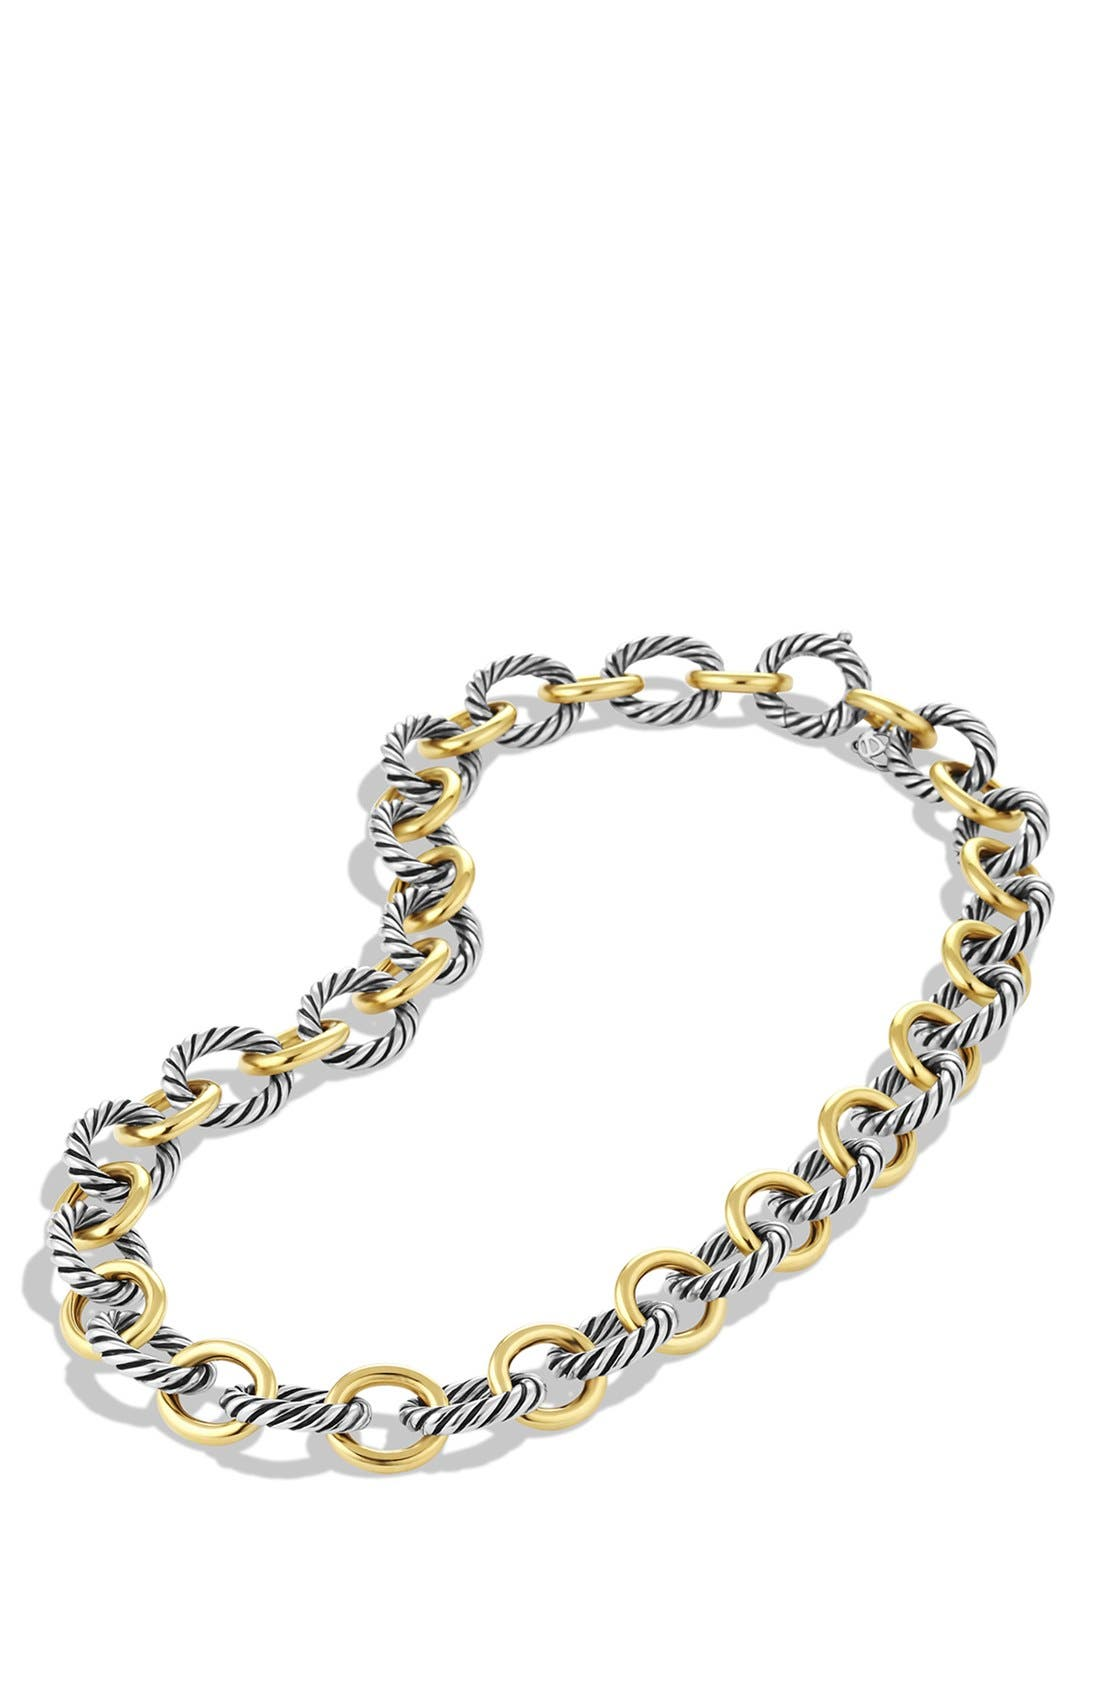 Alternate Image 2  - David Yurman 'Oval' Large Link Necklace with Gold